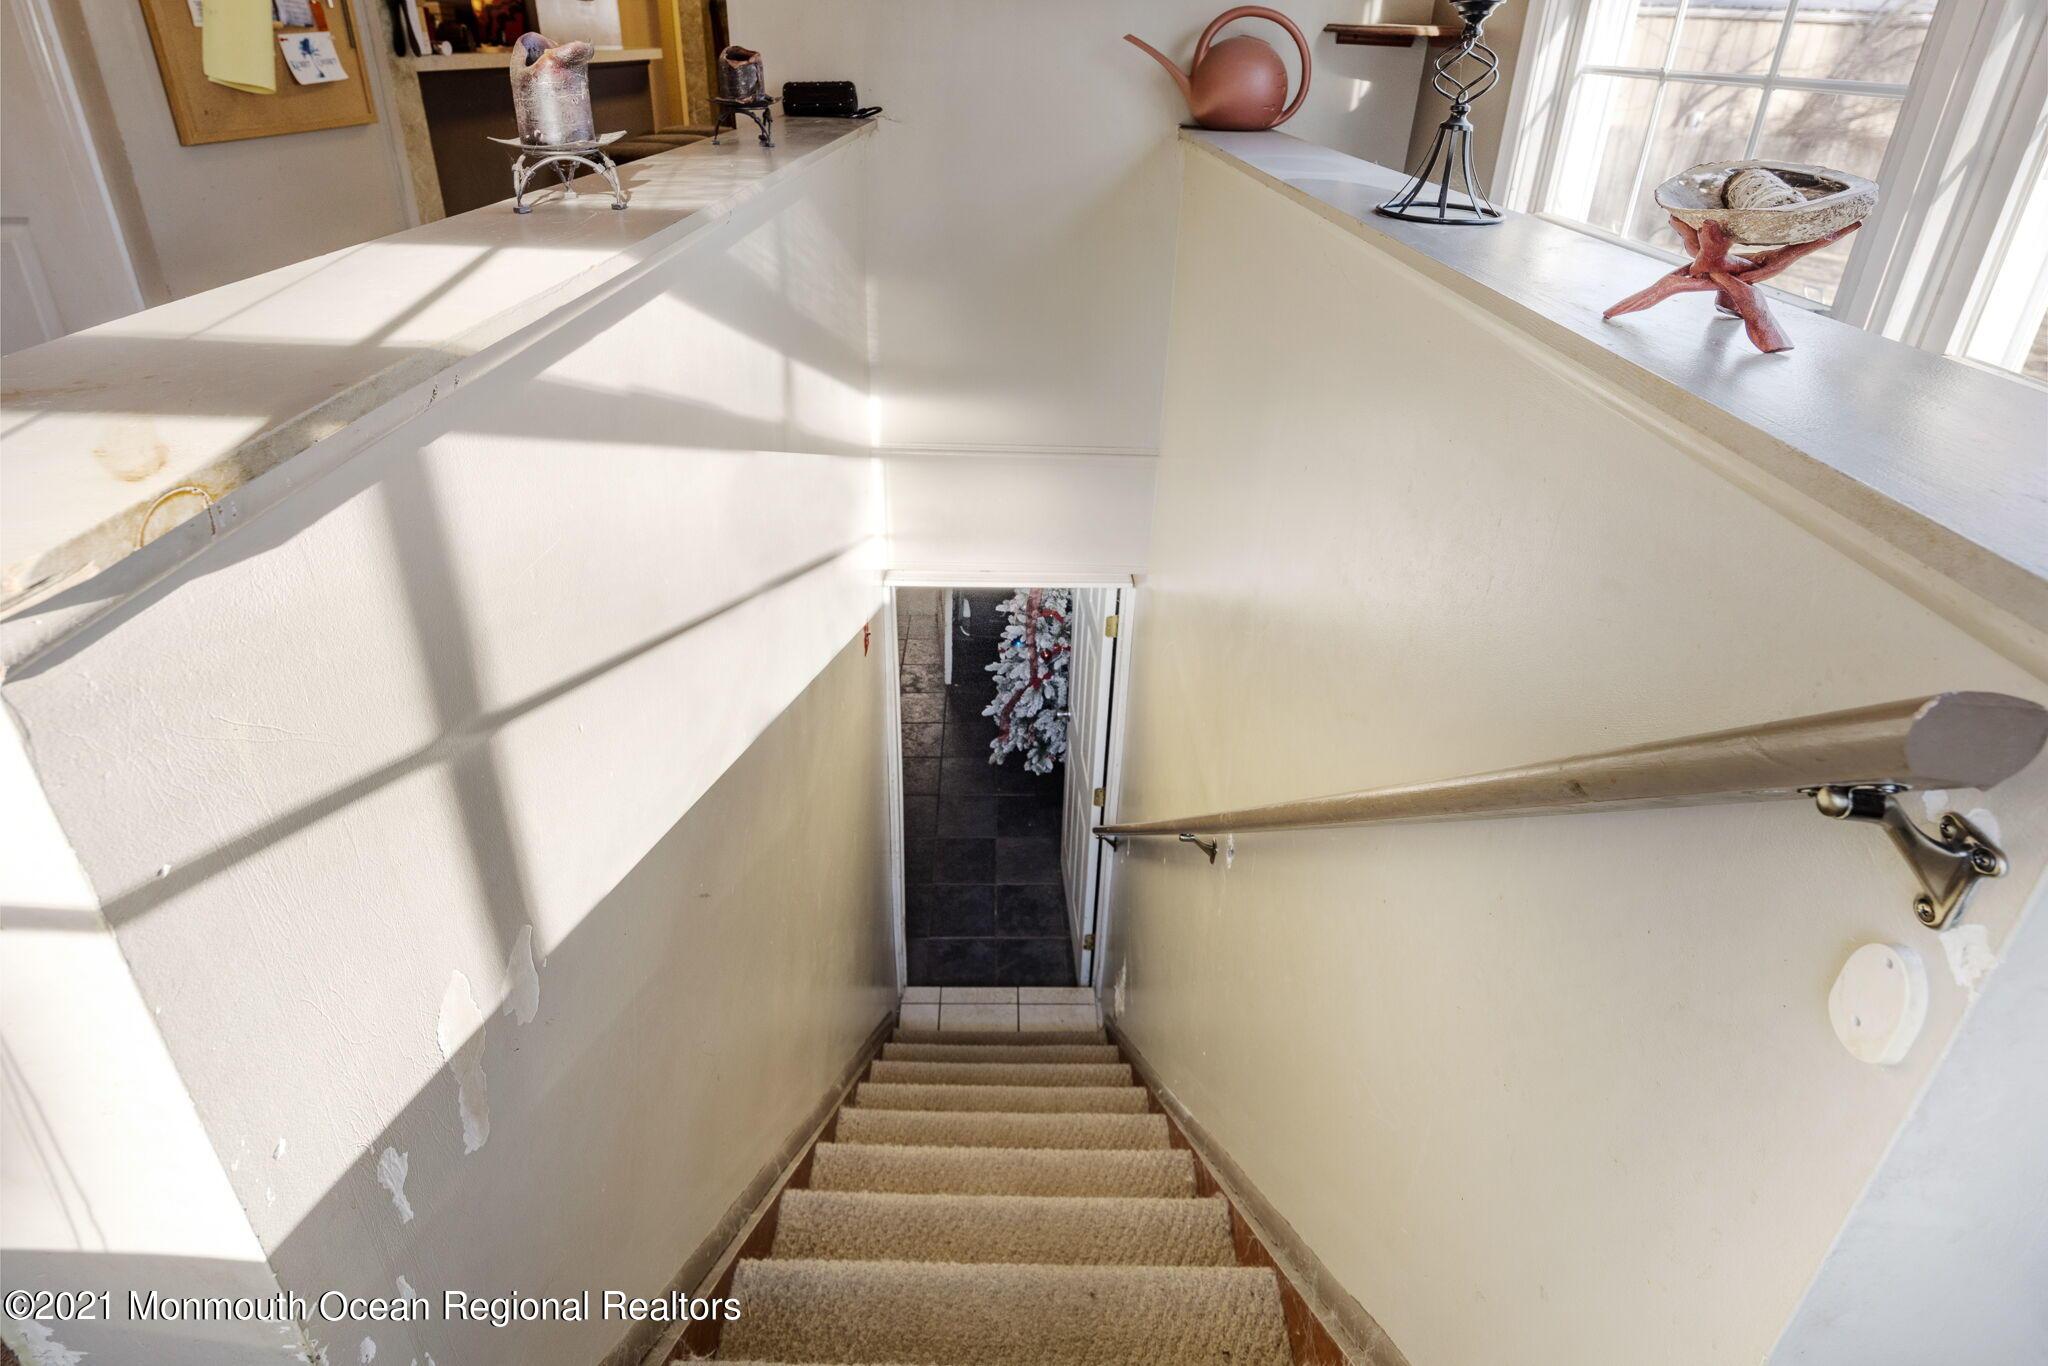 155 Cedar Grove Road, Toms River, New Jersey 08753, 3 Bedrooms Bedrooms, ,1 BathroomBathrooms,Single Family,For Sale,155 Cedar Grove Road,1,22104929